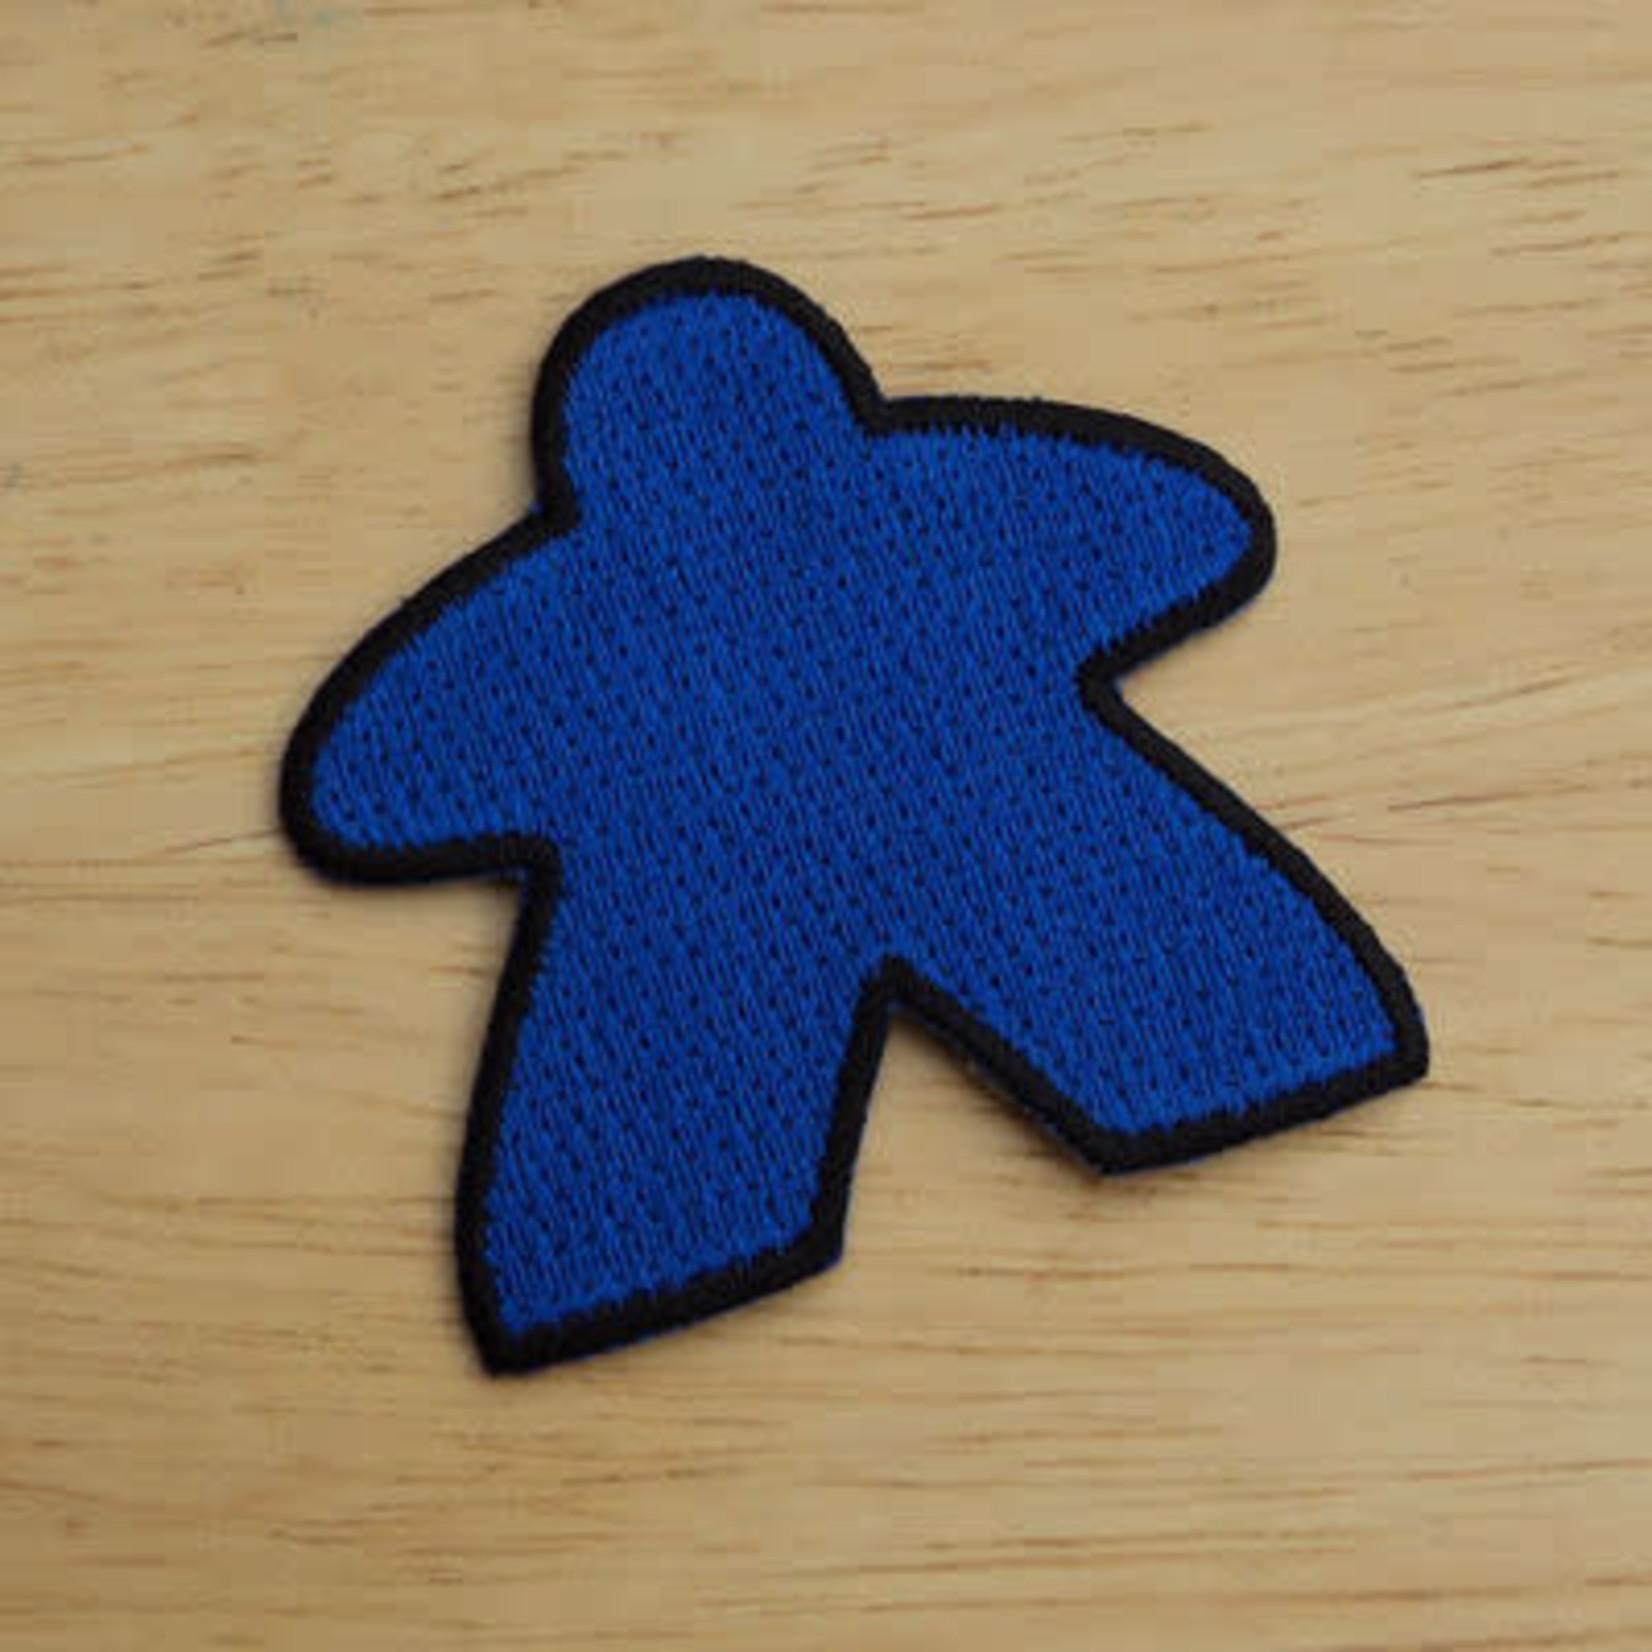 G-Wiz Blue Meeple Player Patch